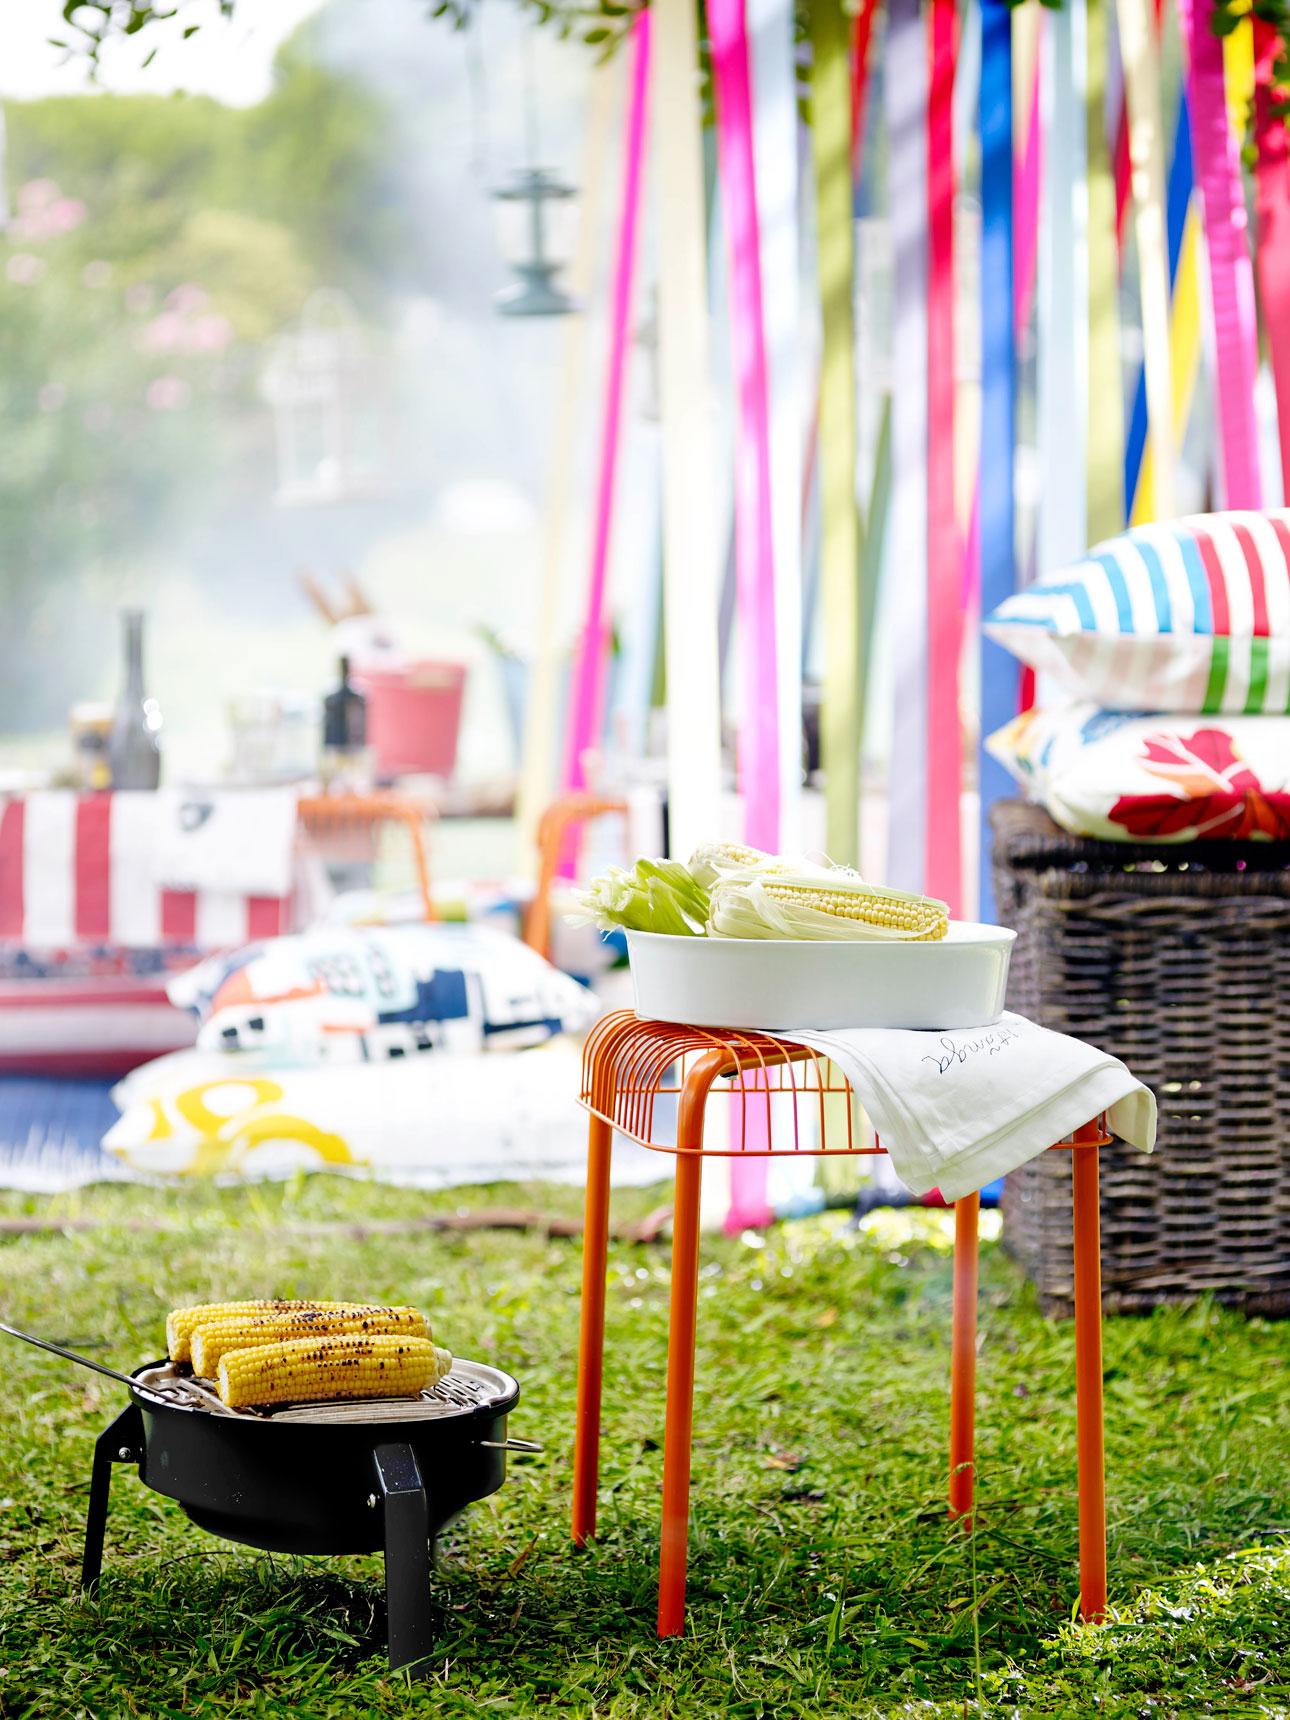 Ikea Sommar 2016 bank barbecue